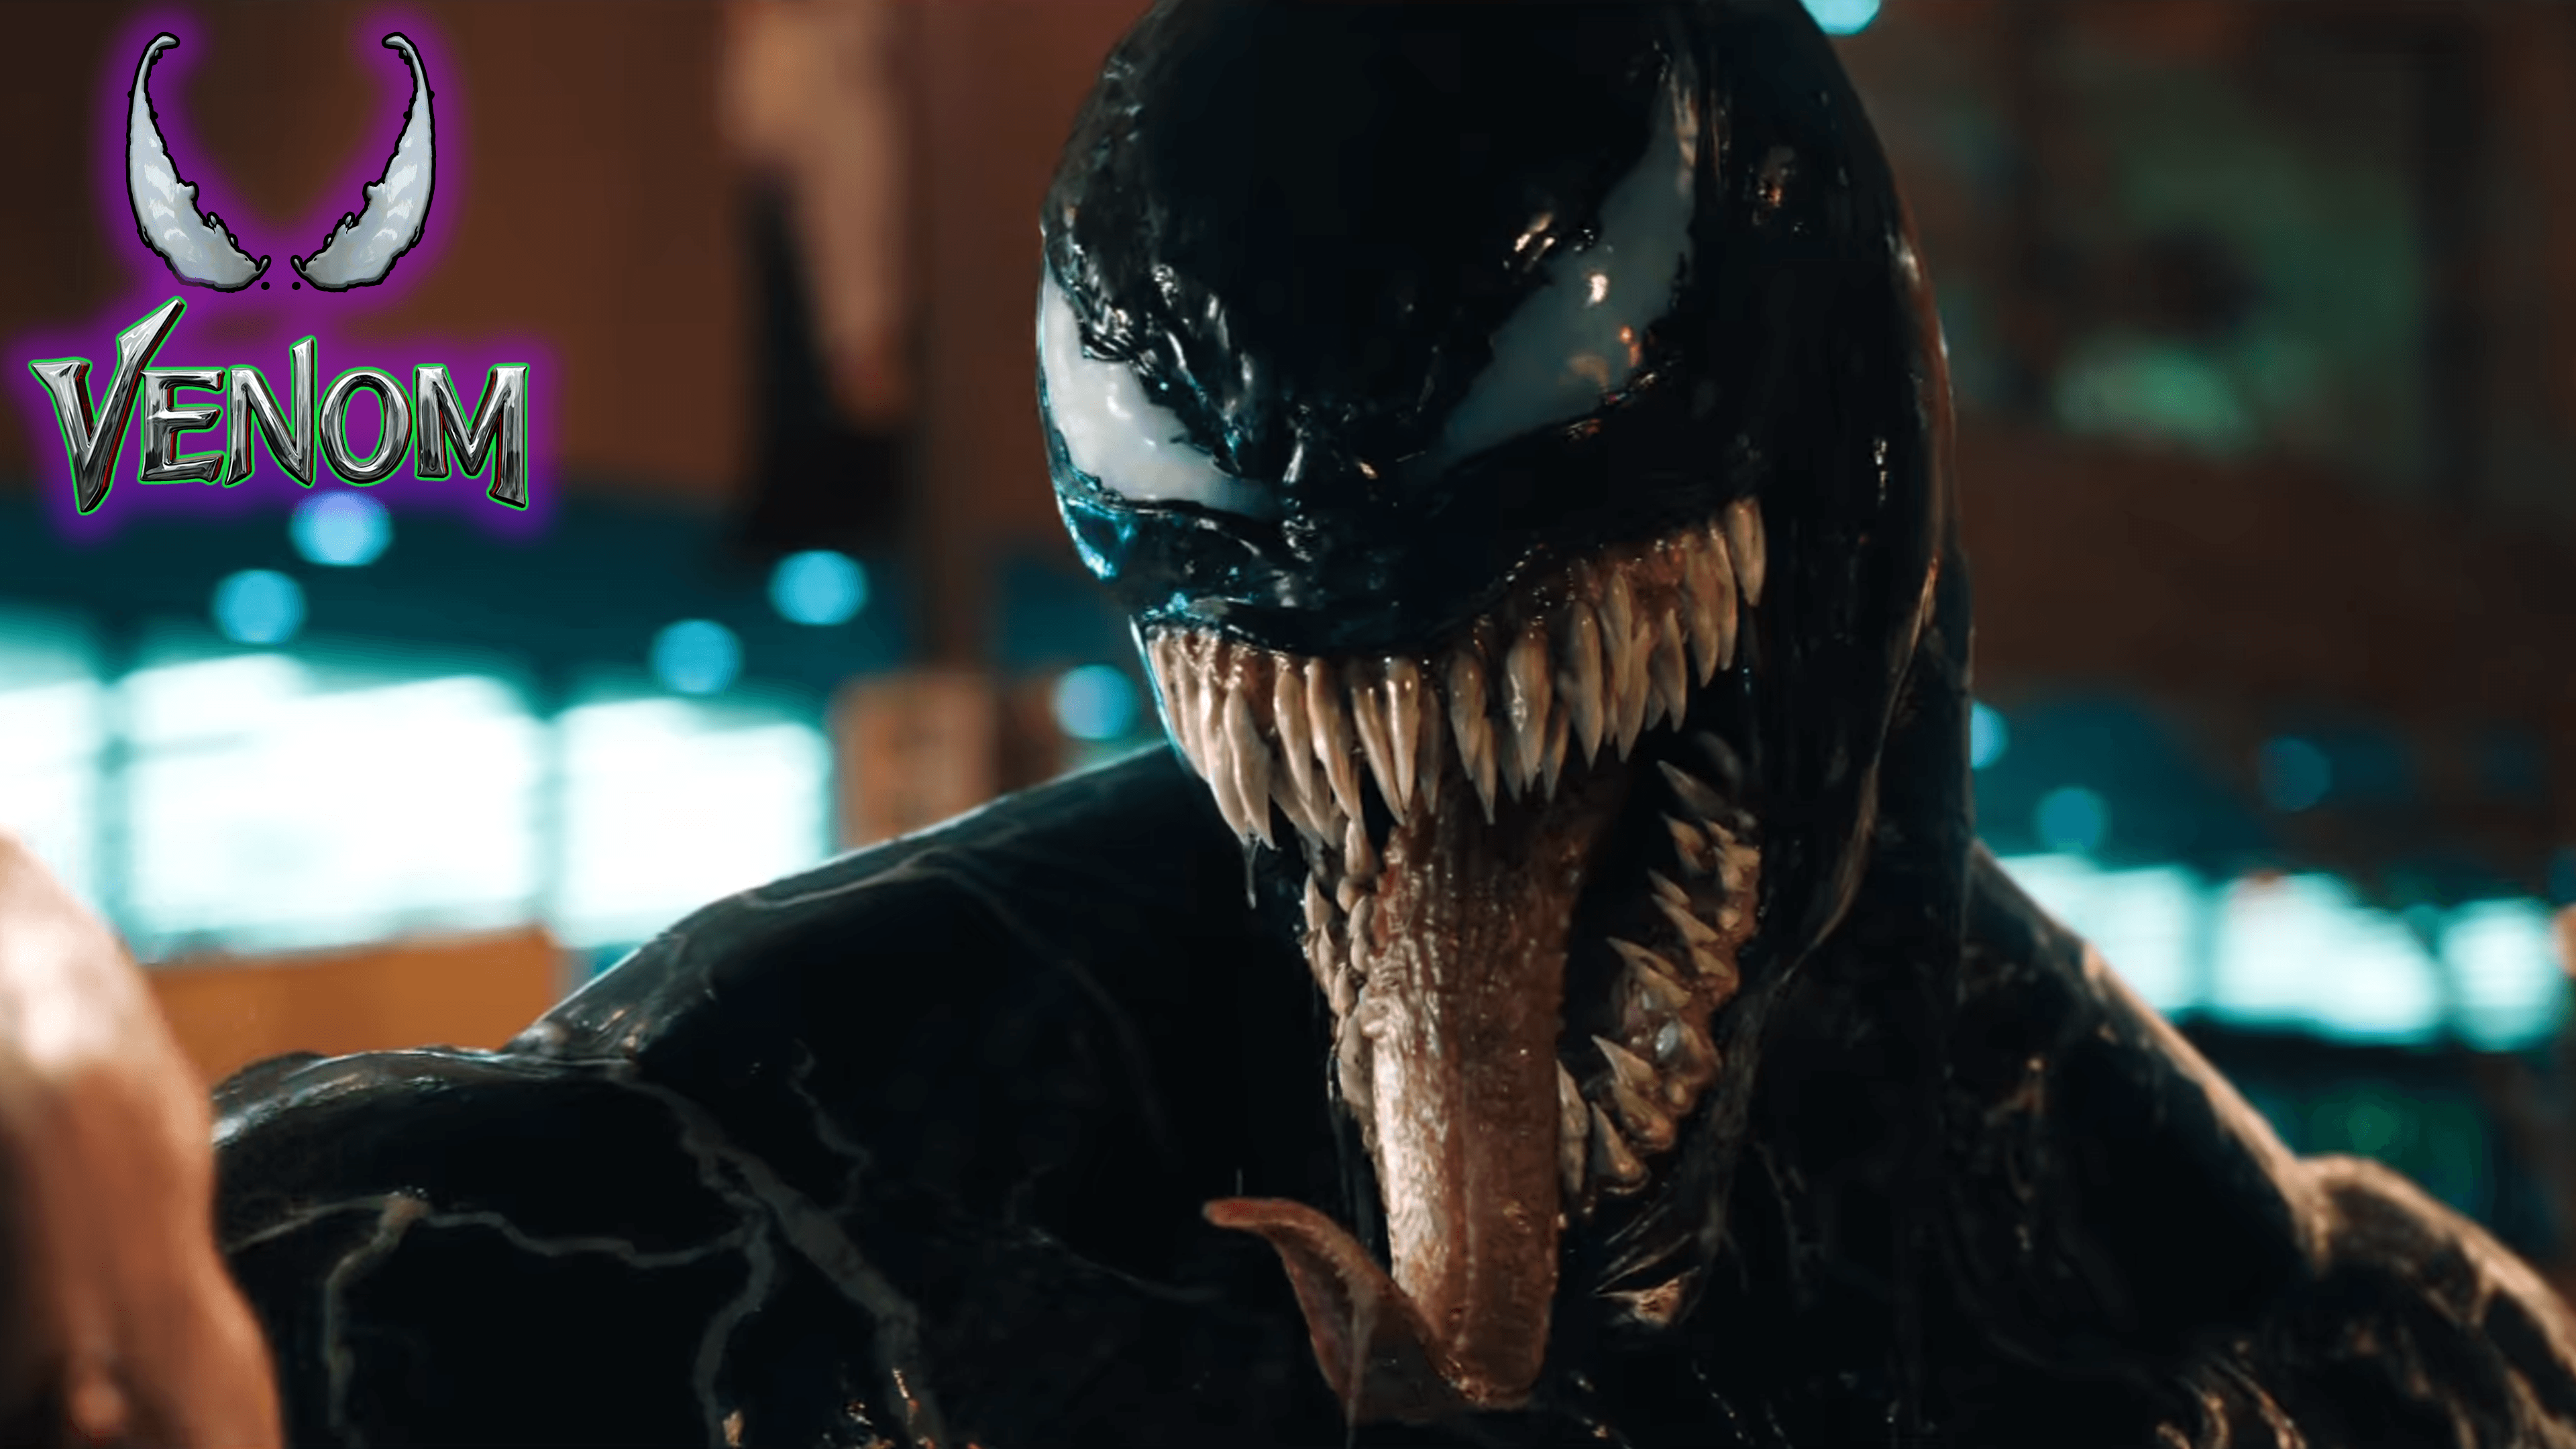 43 Best Free Venom Movie Wallpapers Wallpaperaccess